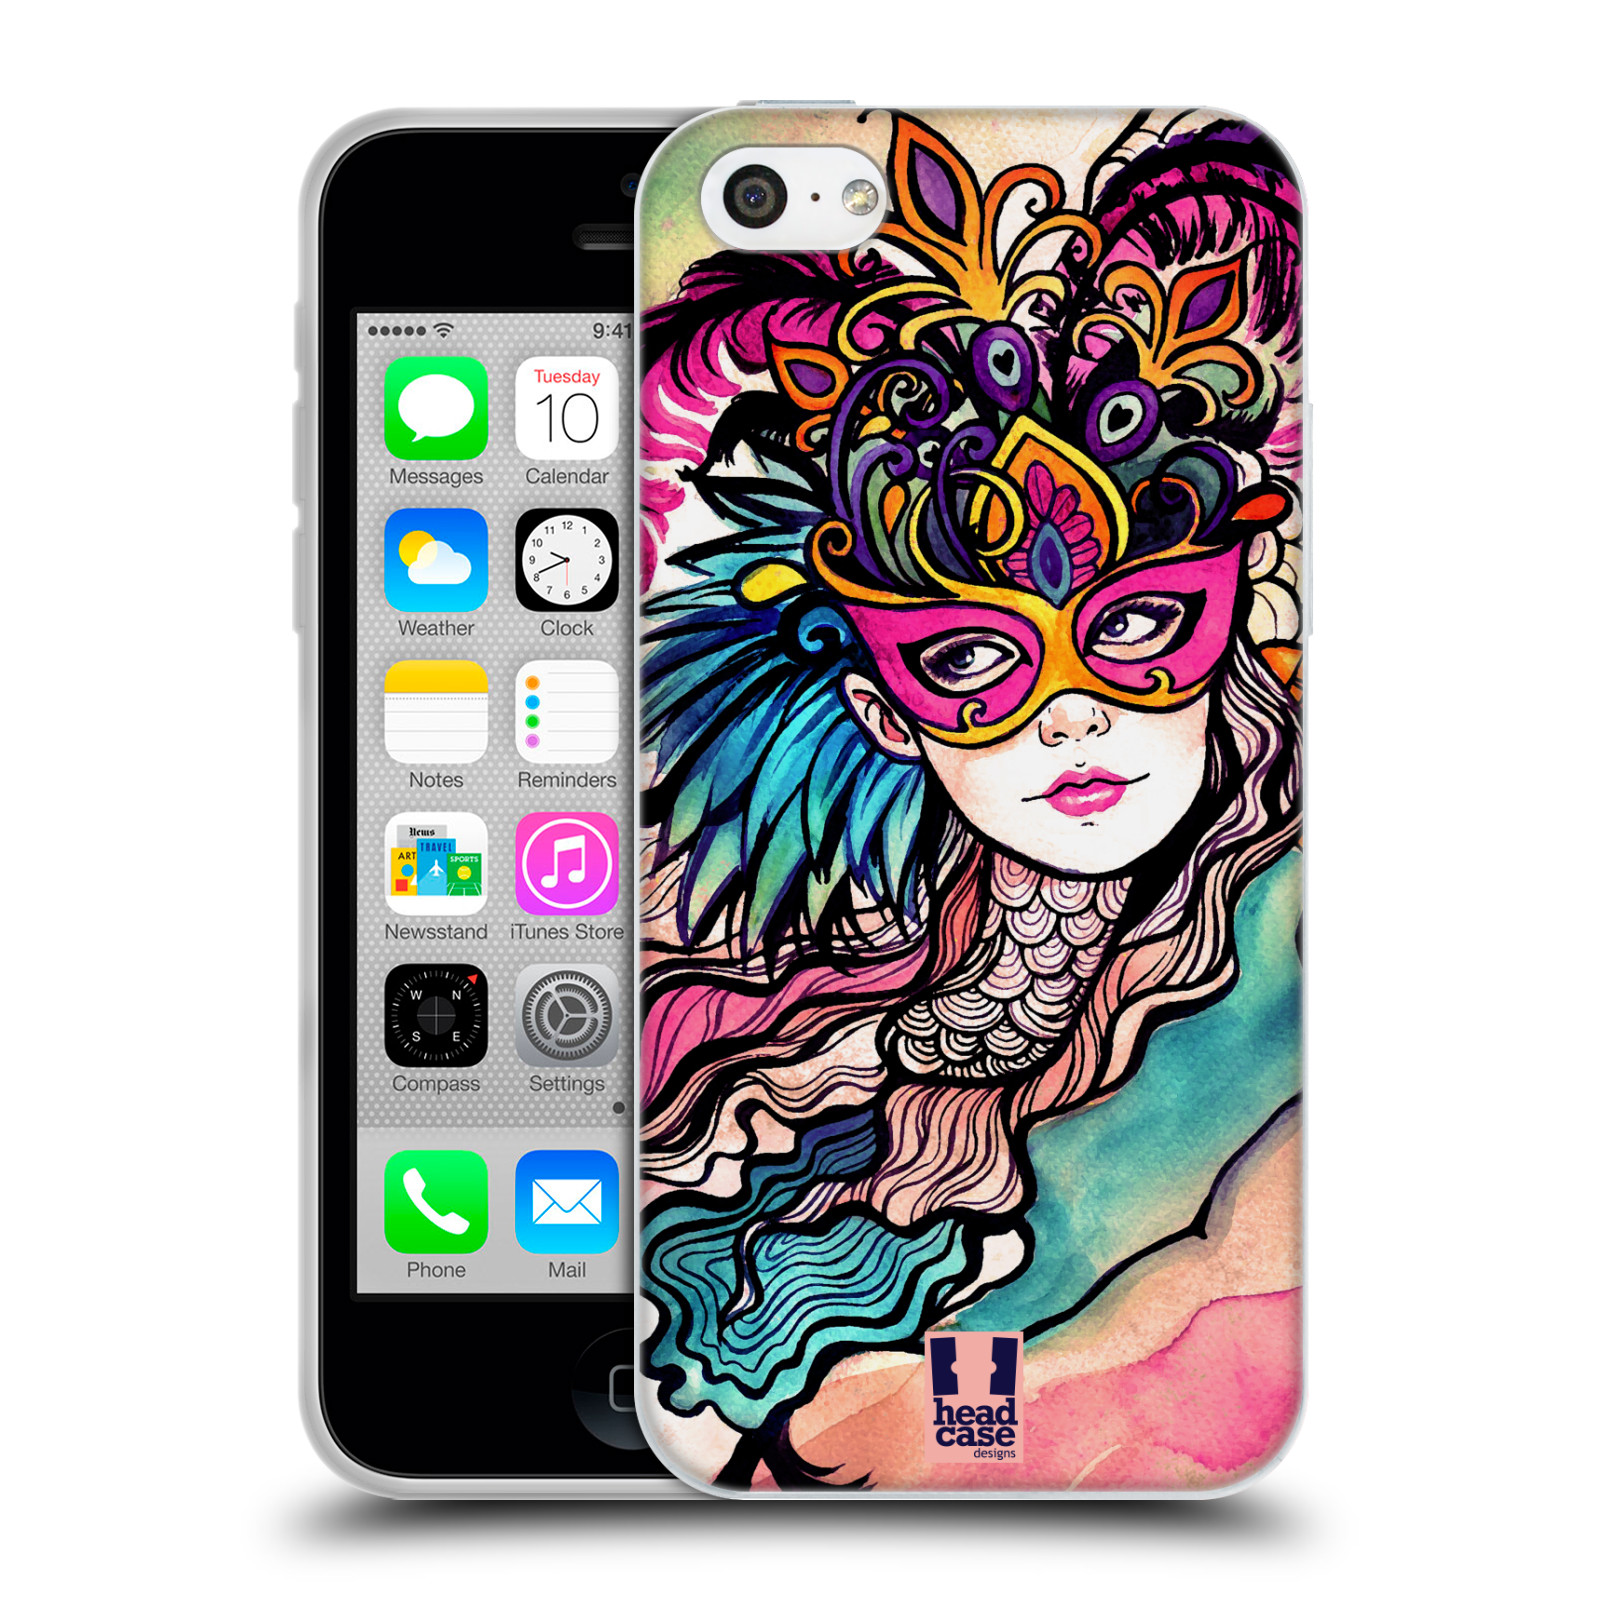 HEAD CASE silikonový obal na mobil Apple Iphone 5C vzor Maškarní ples masky kreslené vzory růžová